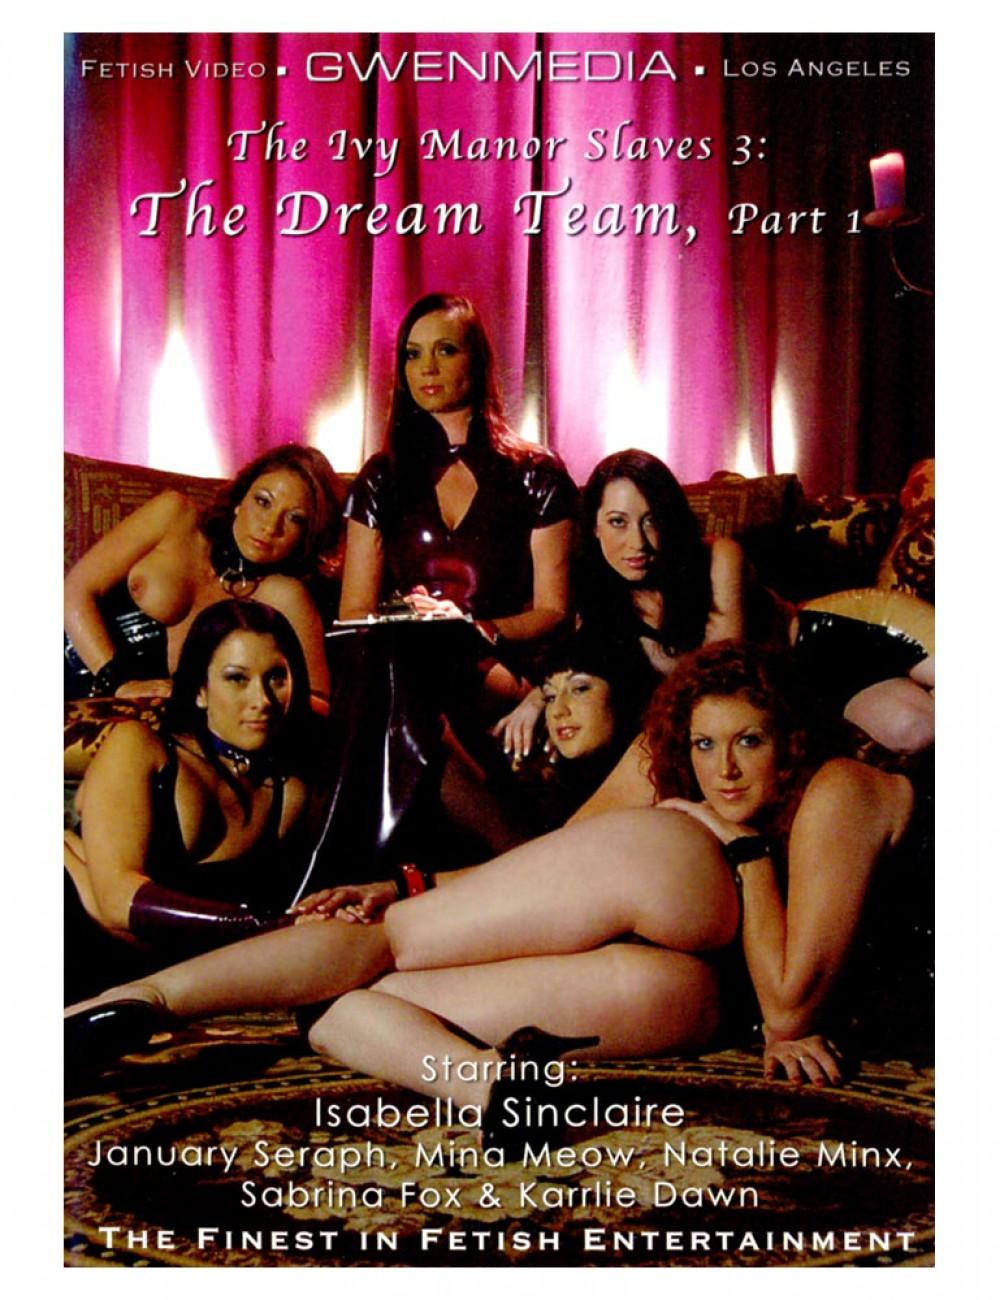 Ivy Manor Slaves 3: The Dream Team Part 1